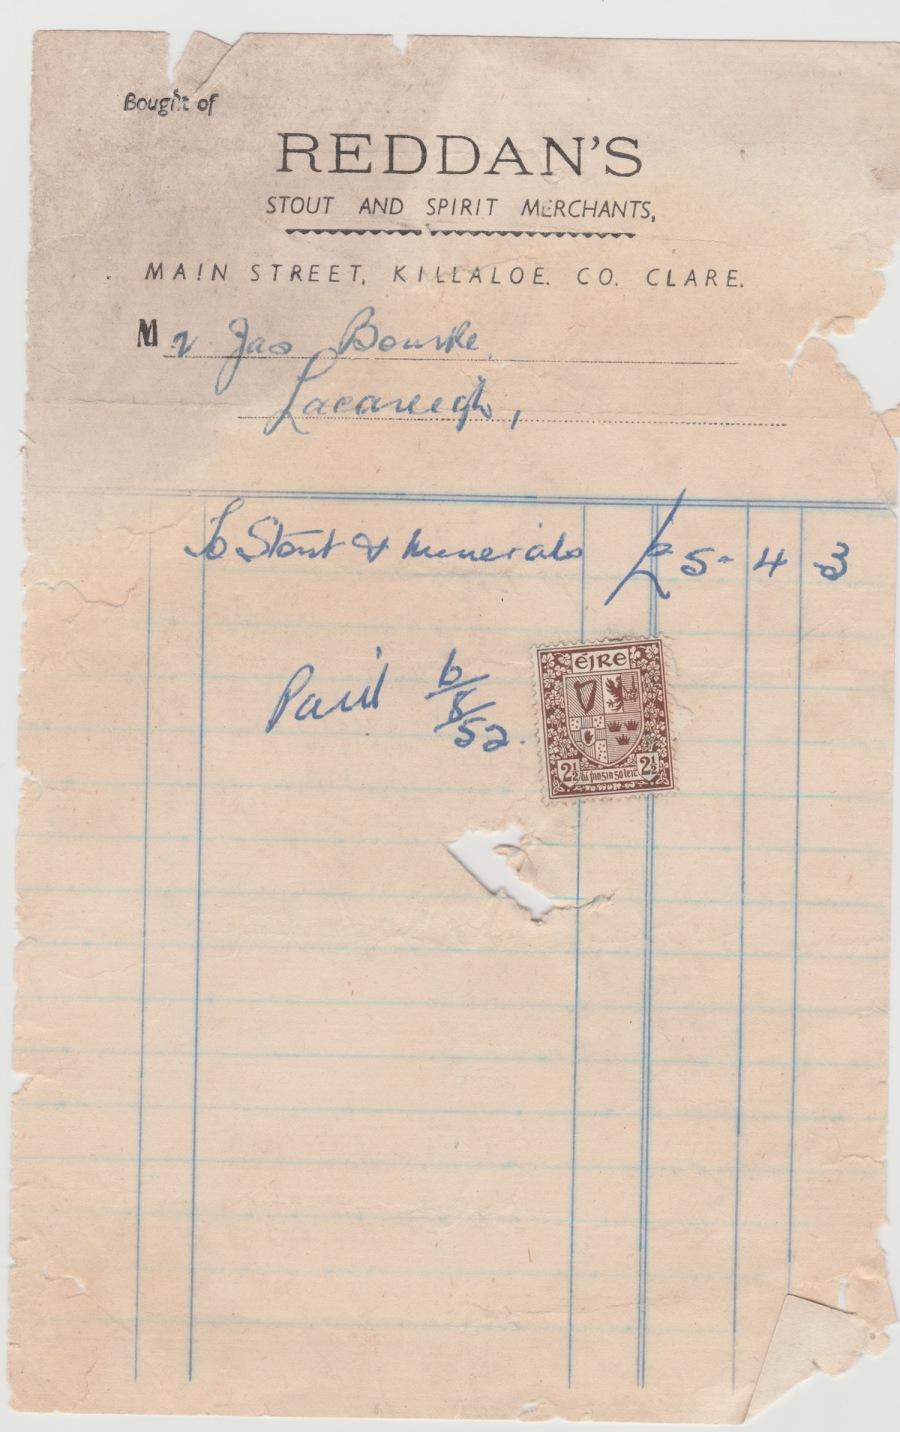 Reddans Receipts 1952